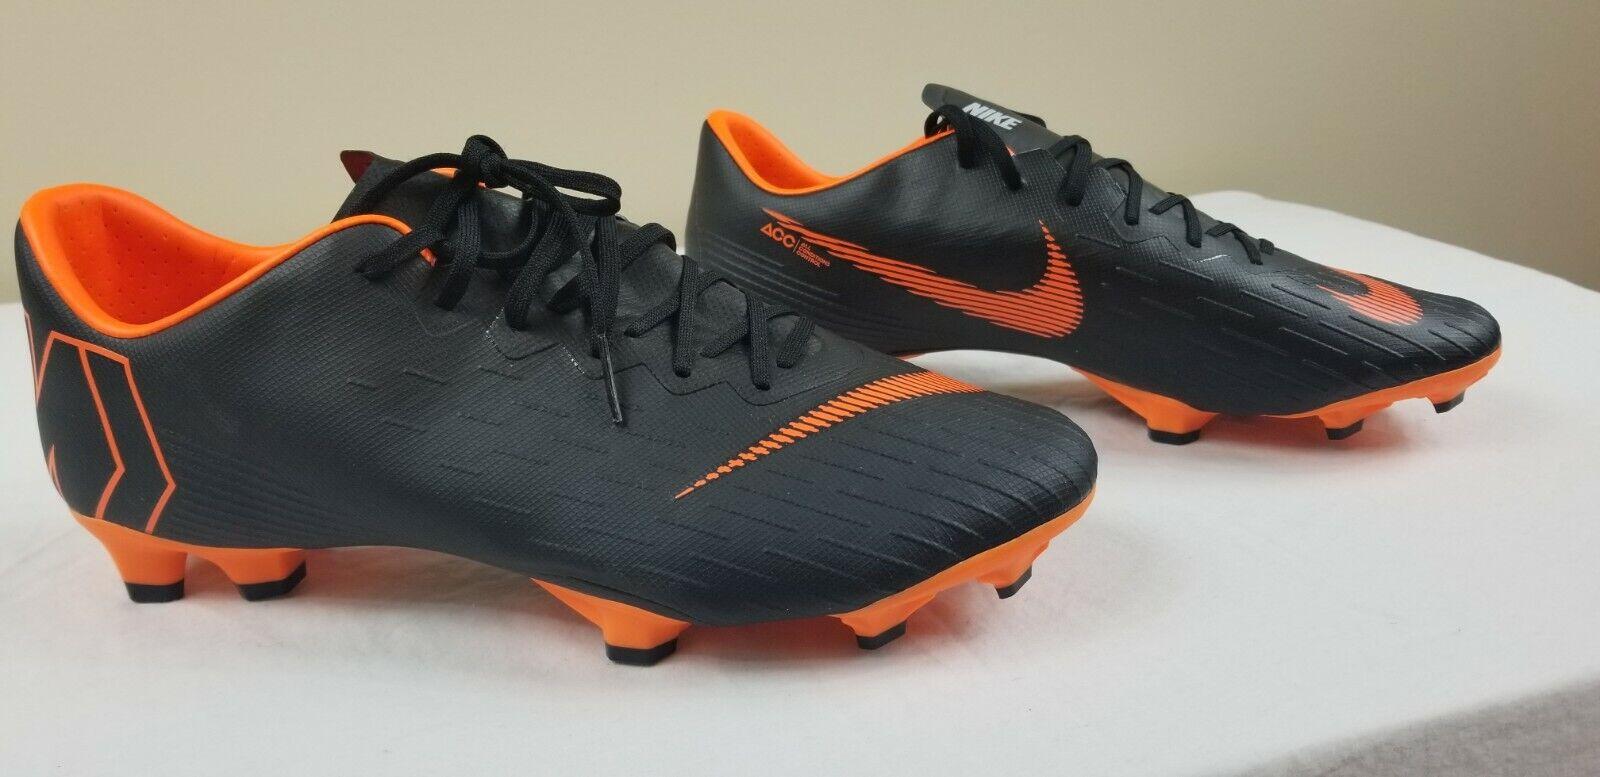 Nike Mercurial Vapor 12 Pro Fg Acc Botines De Fútbol Negro Naranja AH7382-081 Talla 11